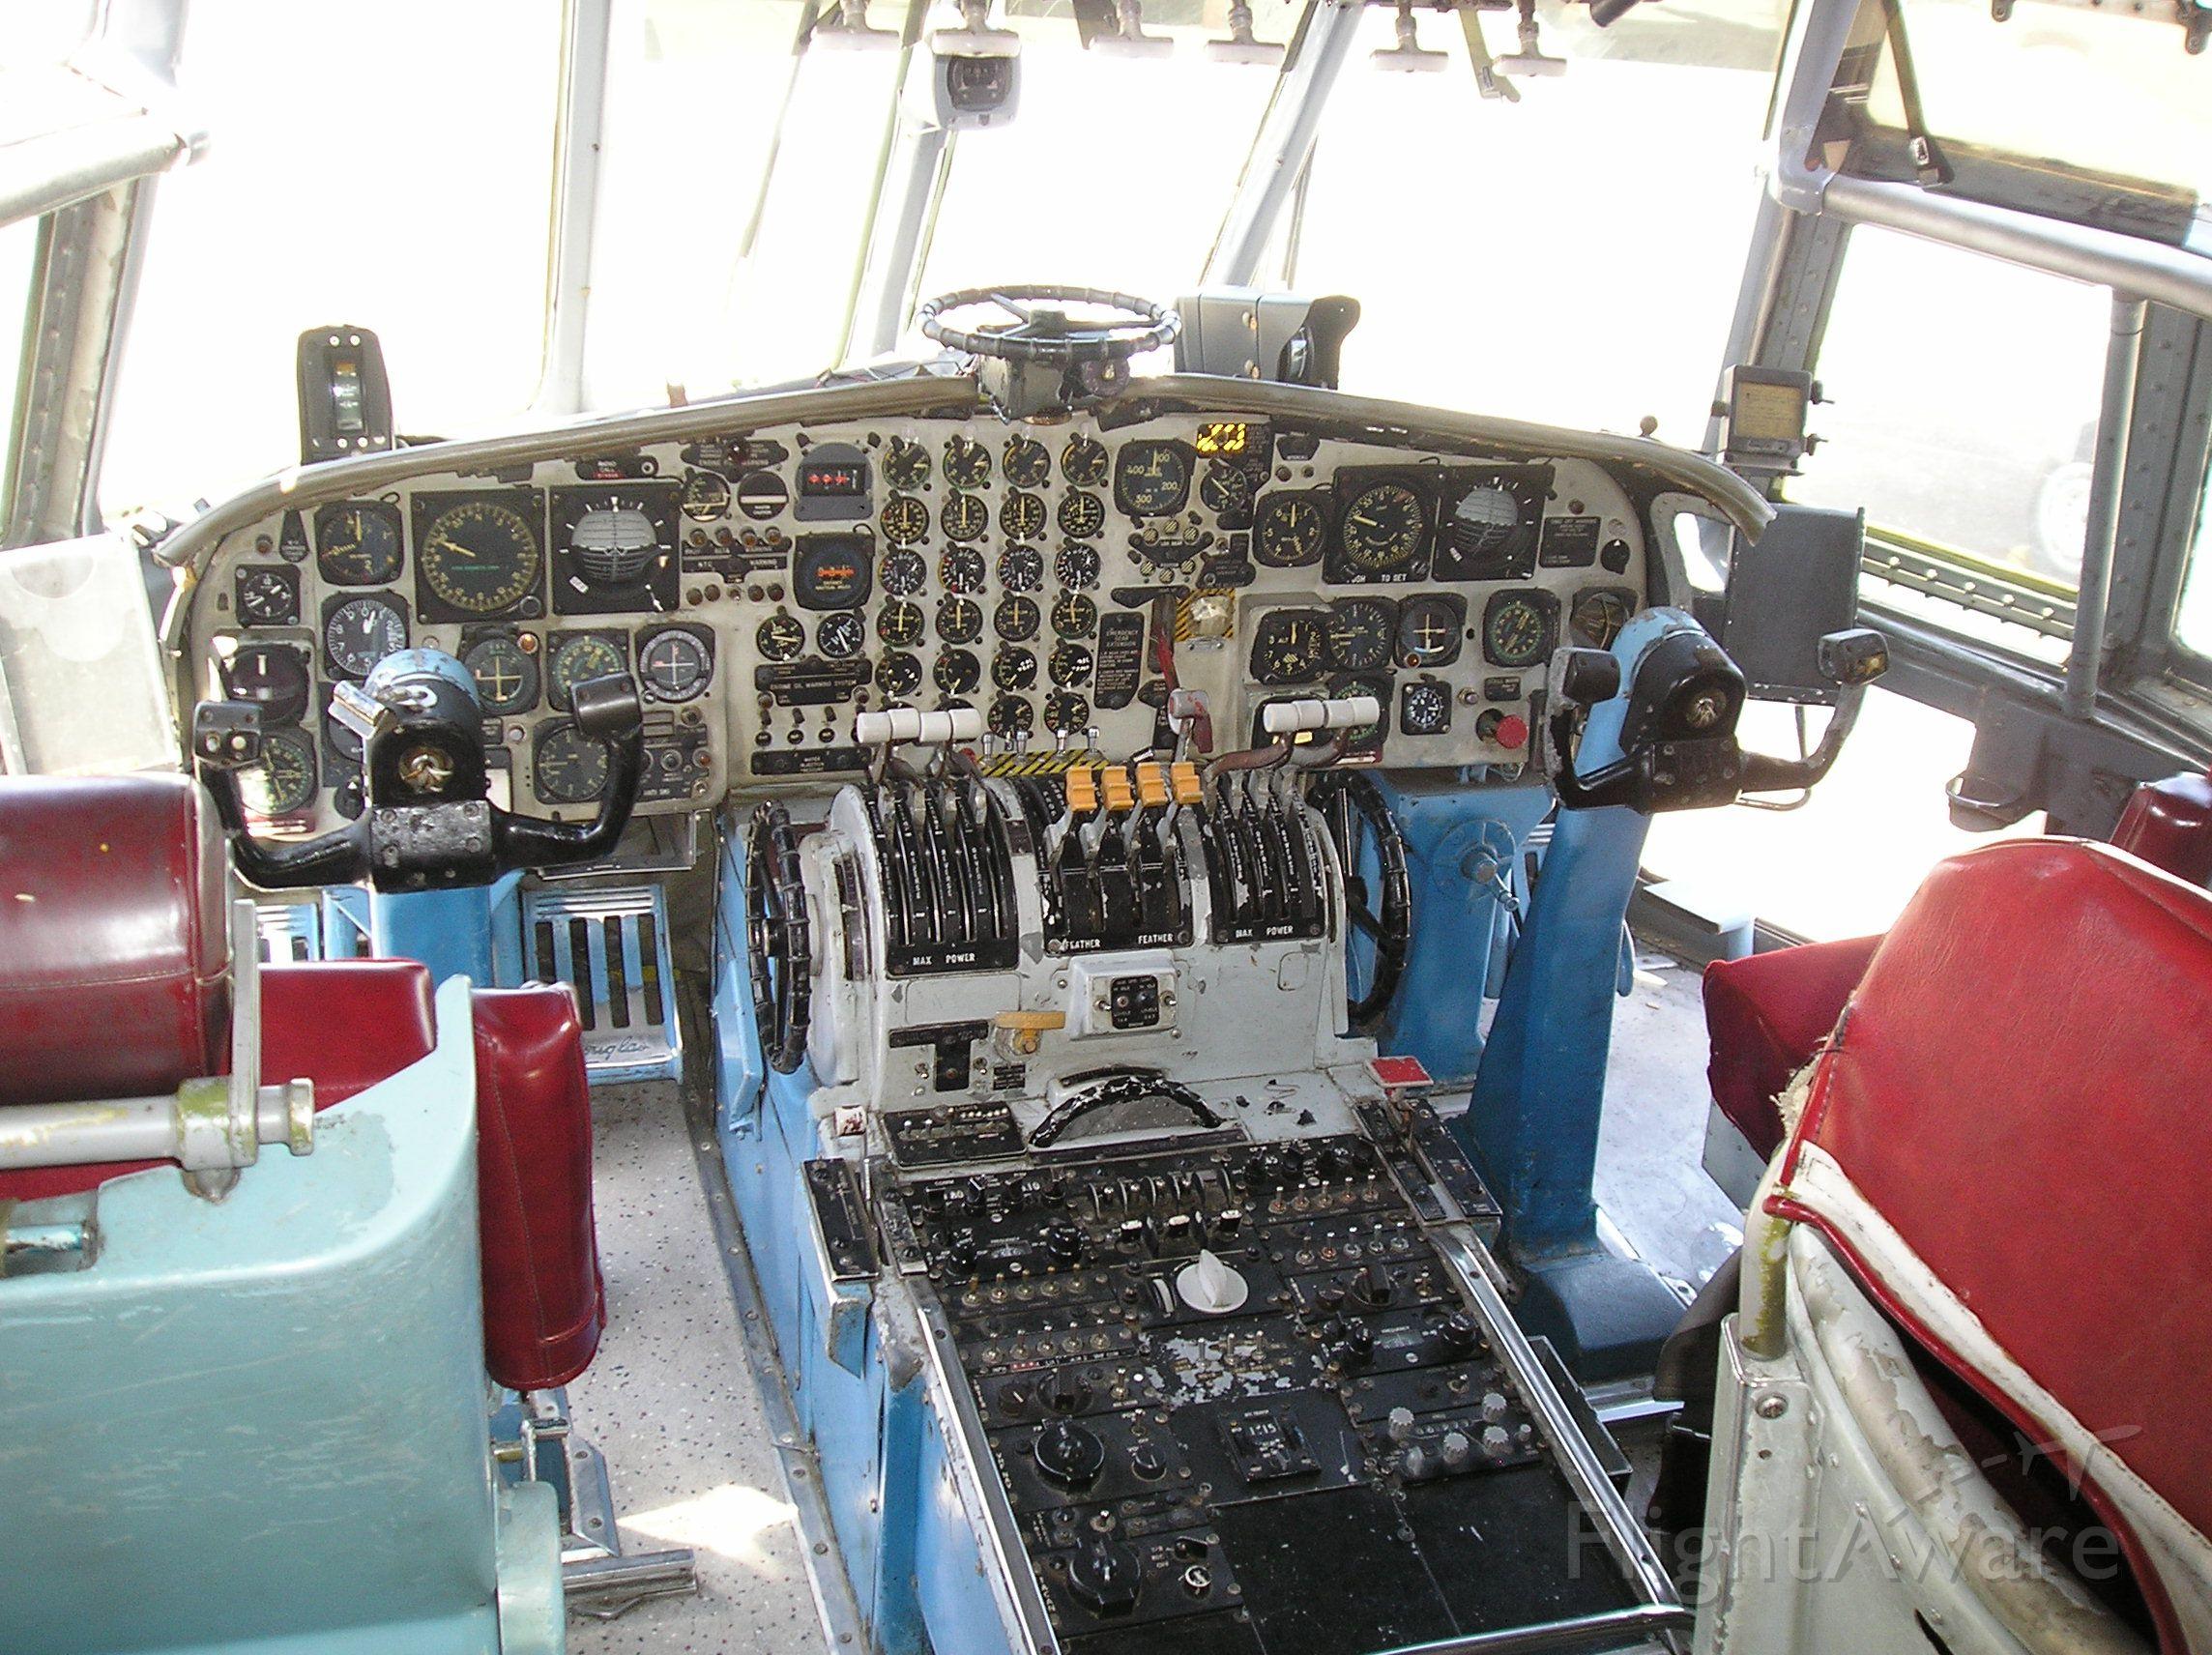 Cessna Skyhawk (N19999) - I was in the cockpit